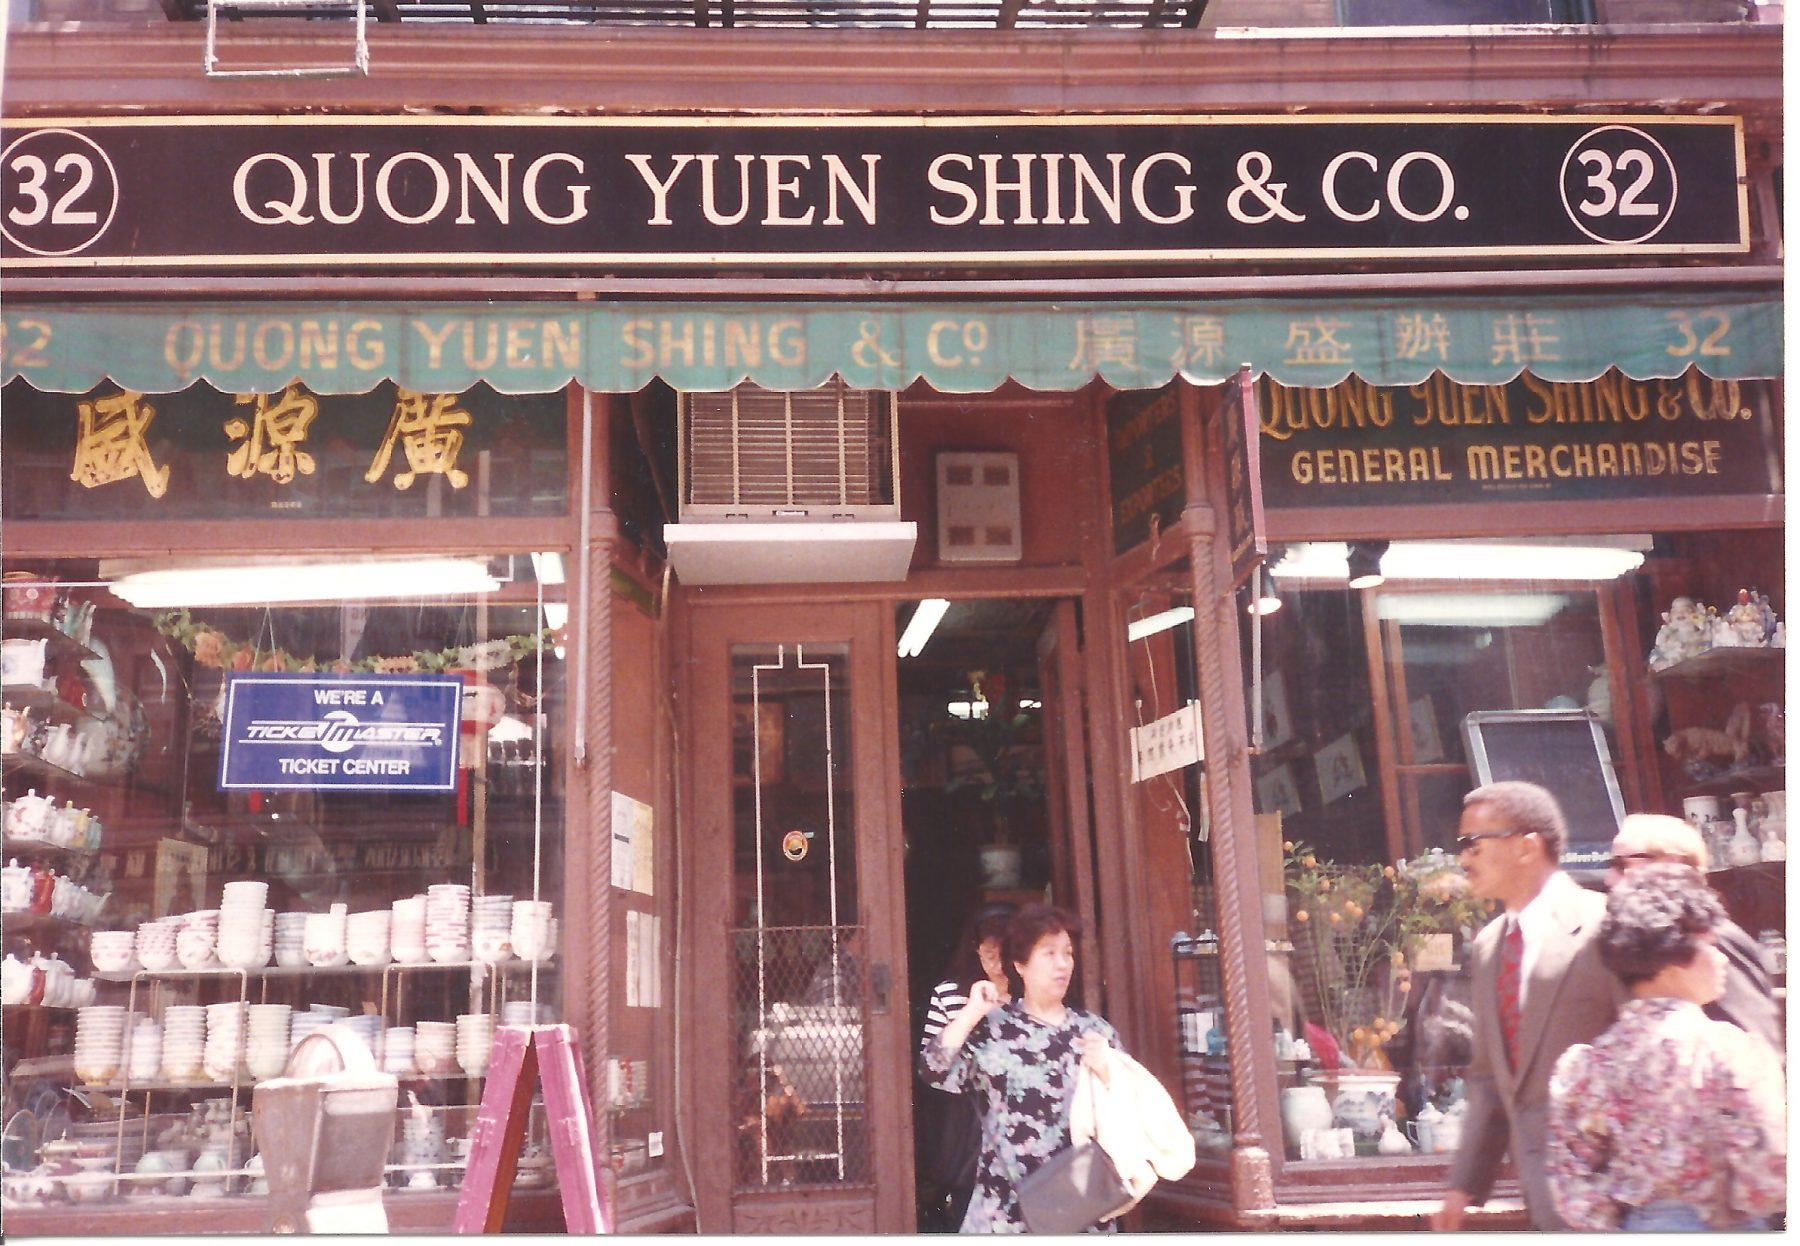 12 September 2019 Posted. Building facade ca. 1992; Museum of Chinese in America (MOCA) Collection. 广源盛建筑正面,大约1992年;美国华人博物馆(MOCA)馆藏